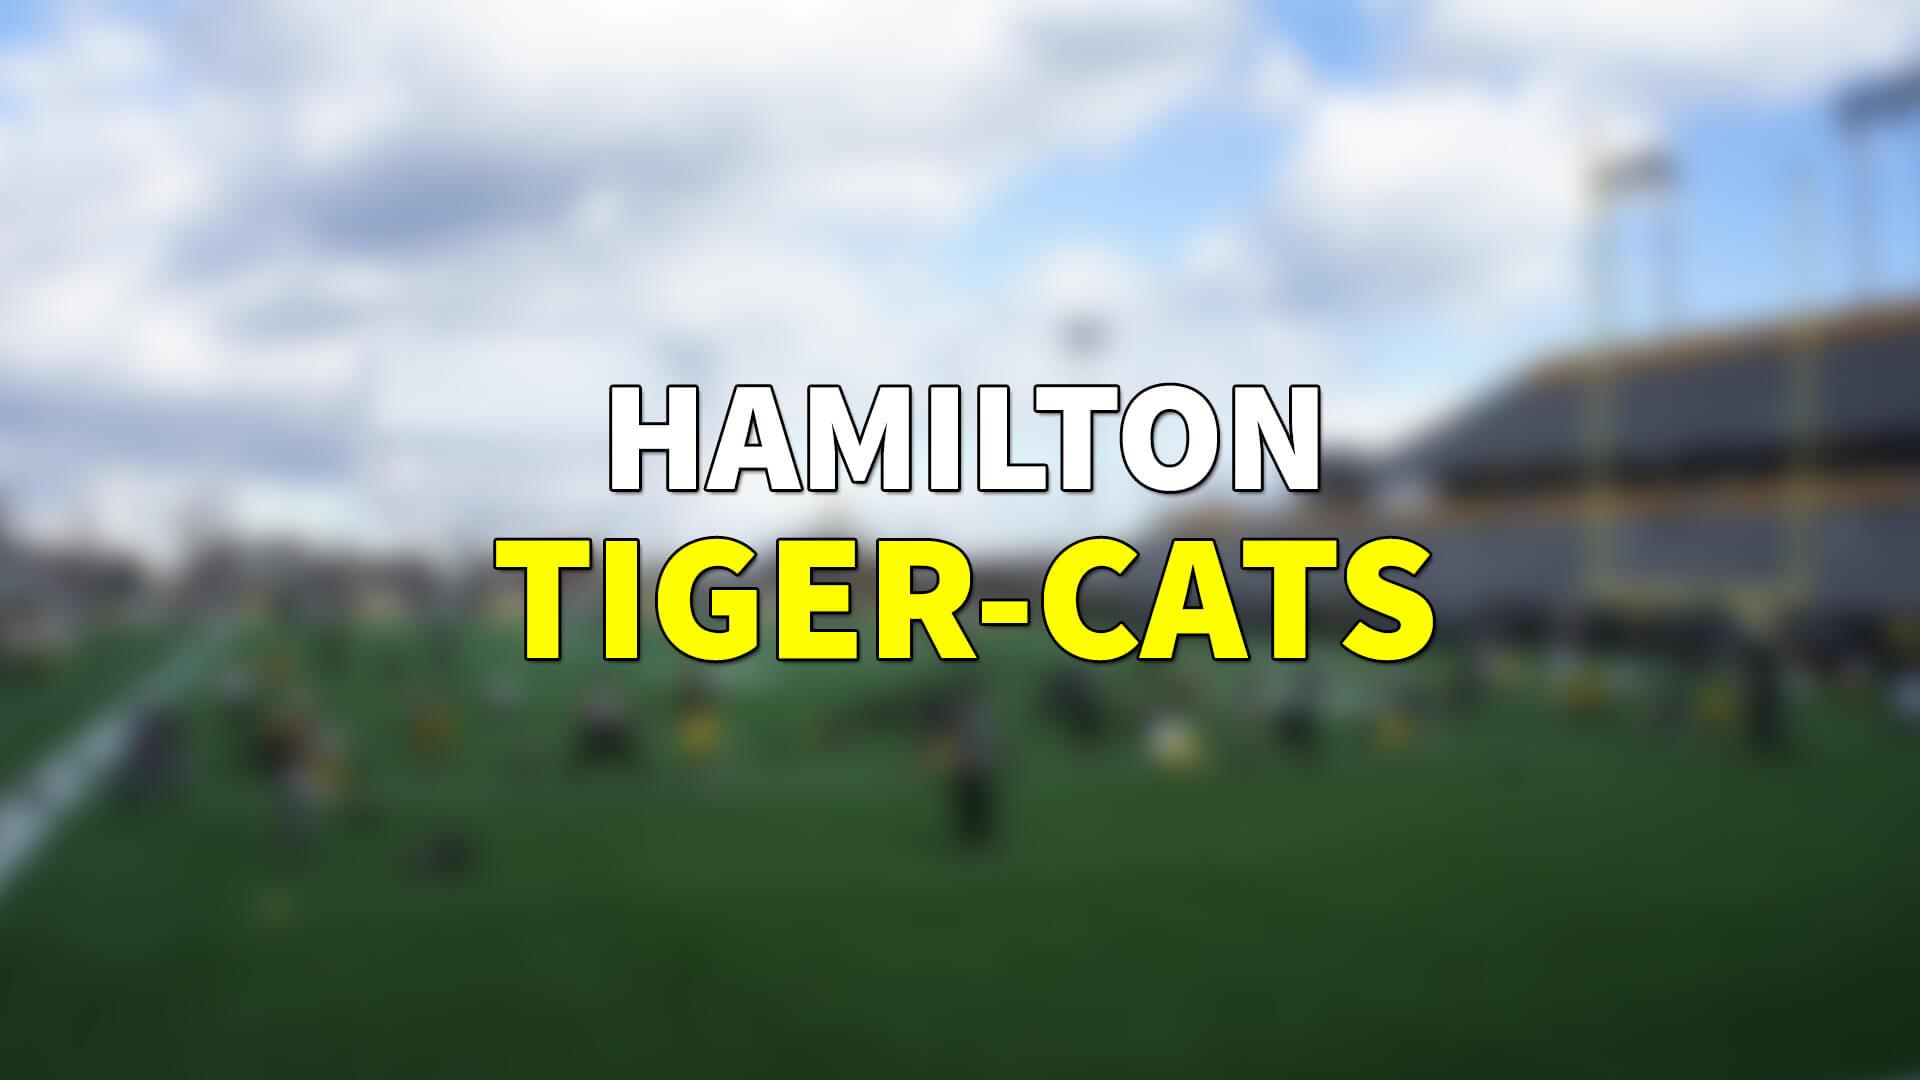 Tiger-Cats 6 Oyuncuyu Kadrosuna Kattı | Korumalı Futbol Türkiye